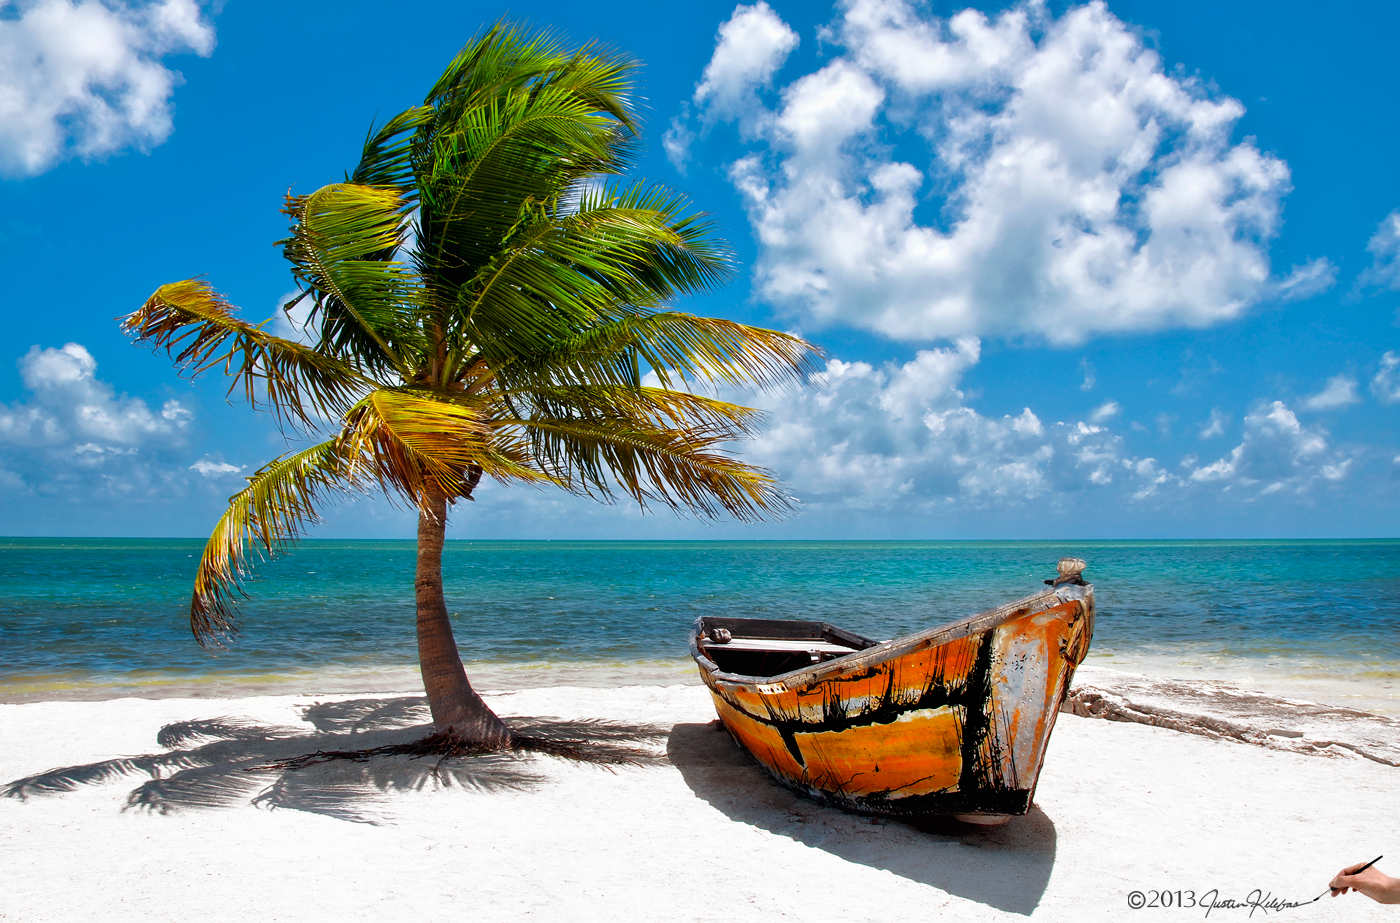 Florida Keys Beach Palm Tree Coconuts Ocean White Sand Boat Justin Kelefas Hdrcustoms Florida Keys Beaches Florida Beaches Beach Wallpaper